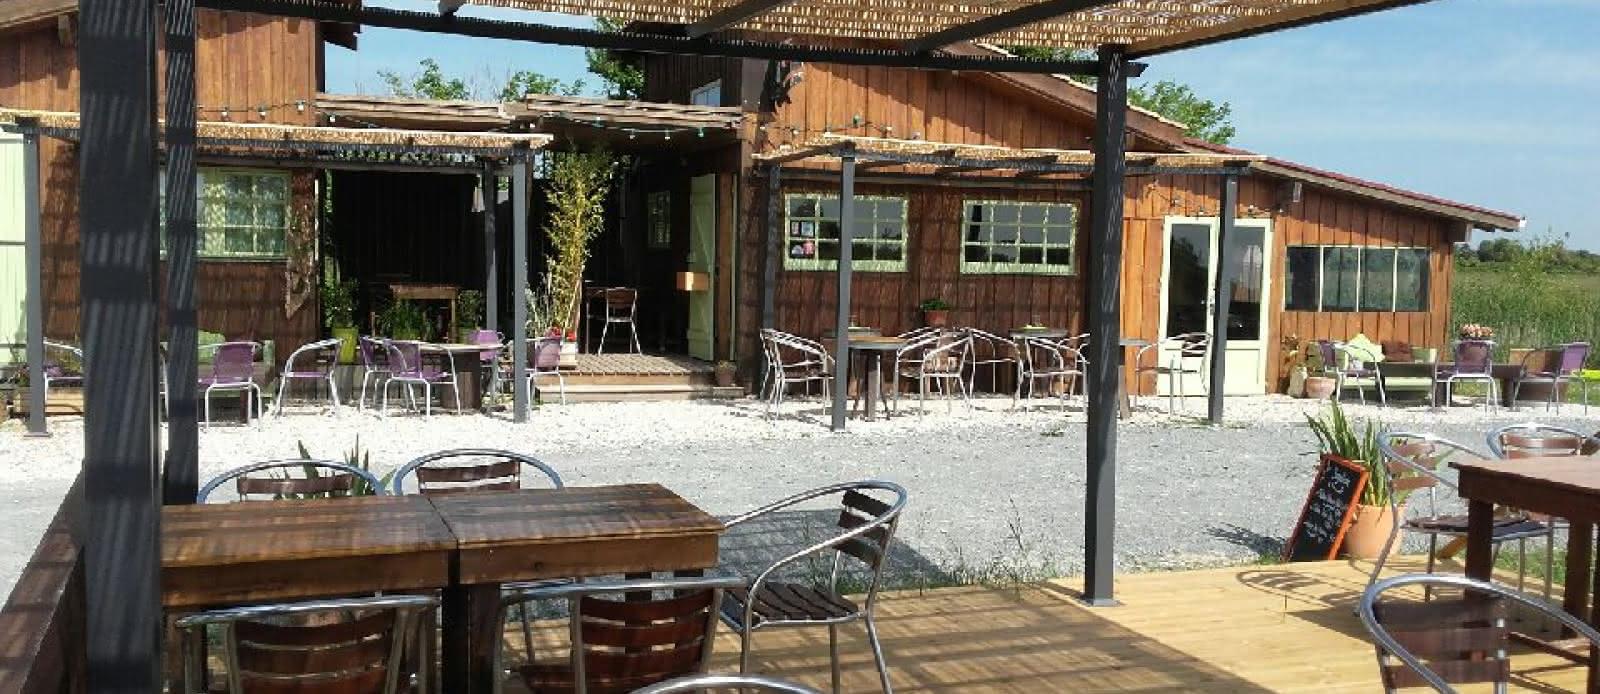 Le-Kayak-Cafe-2